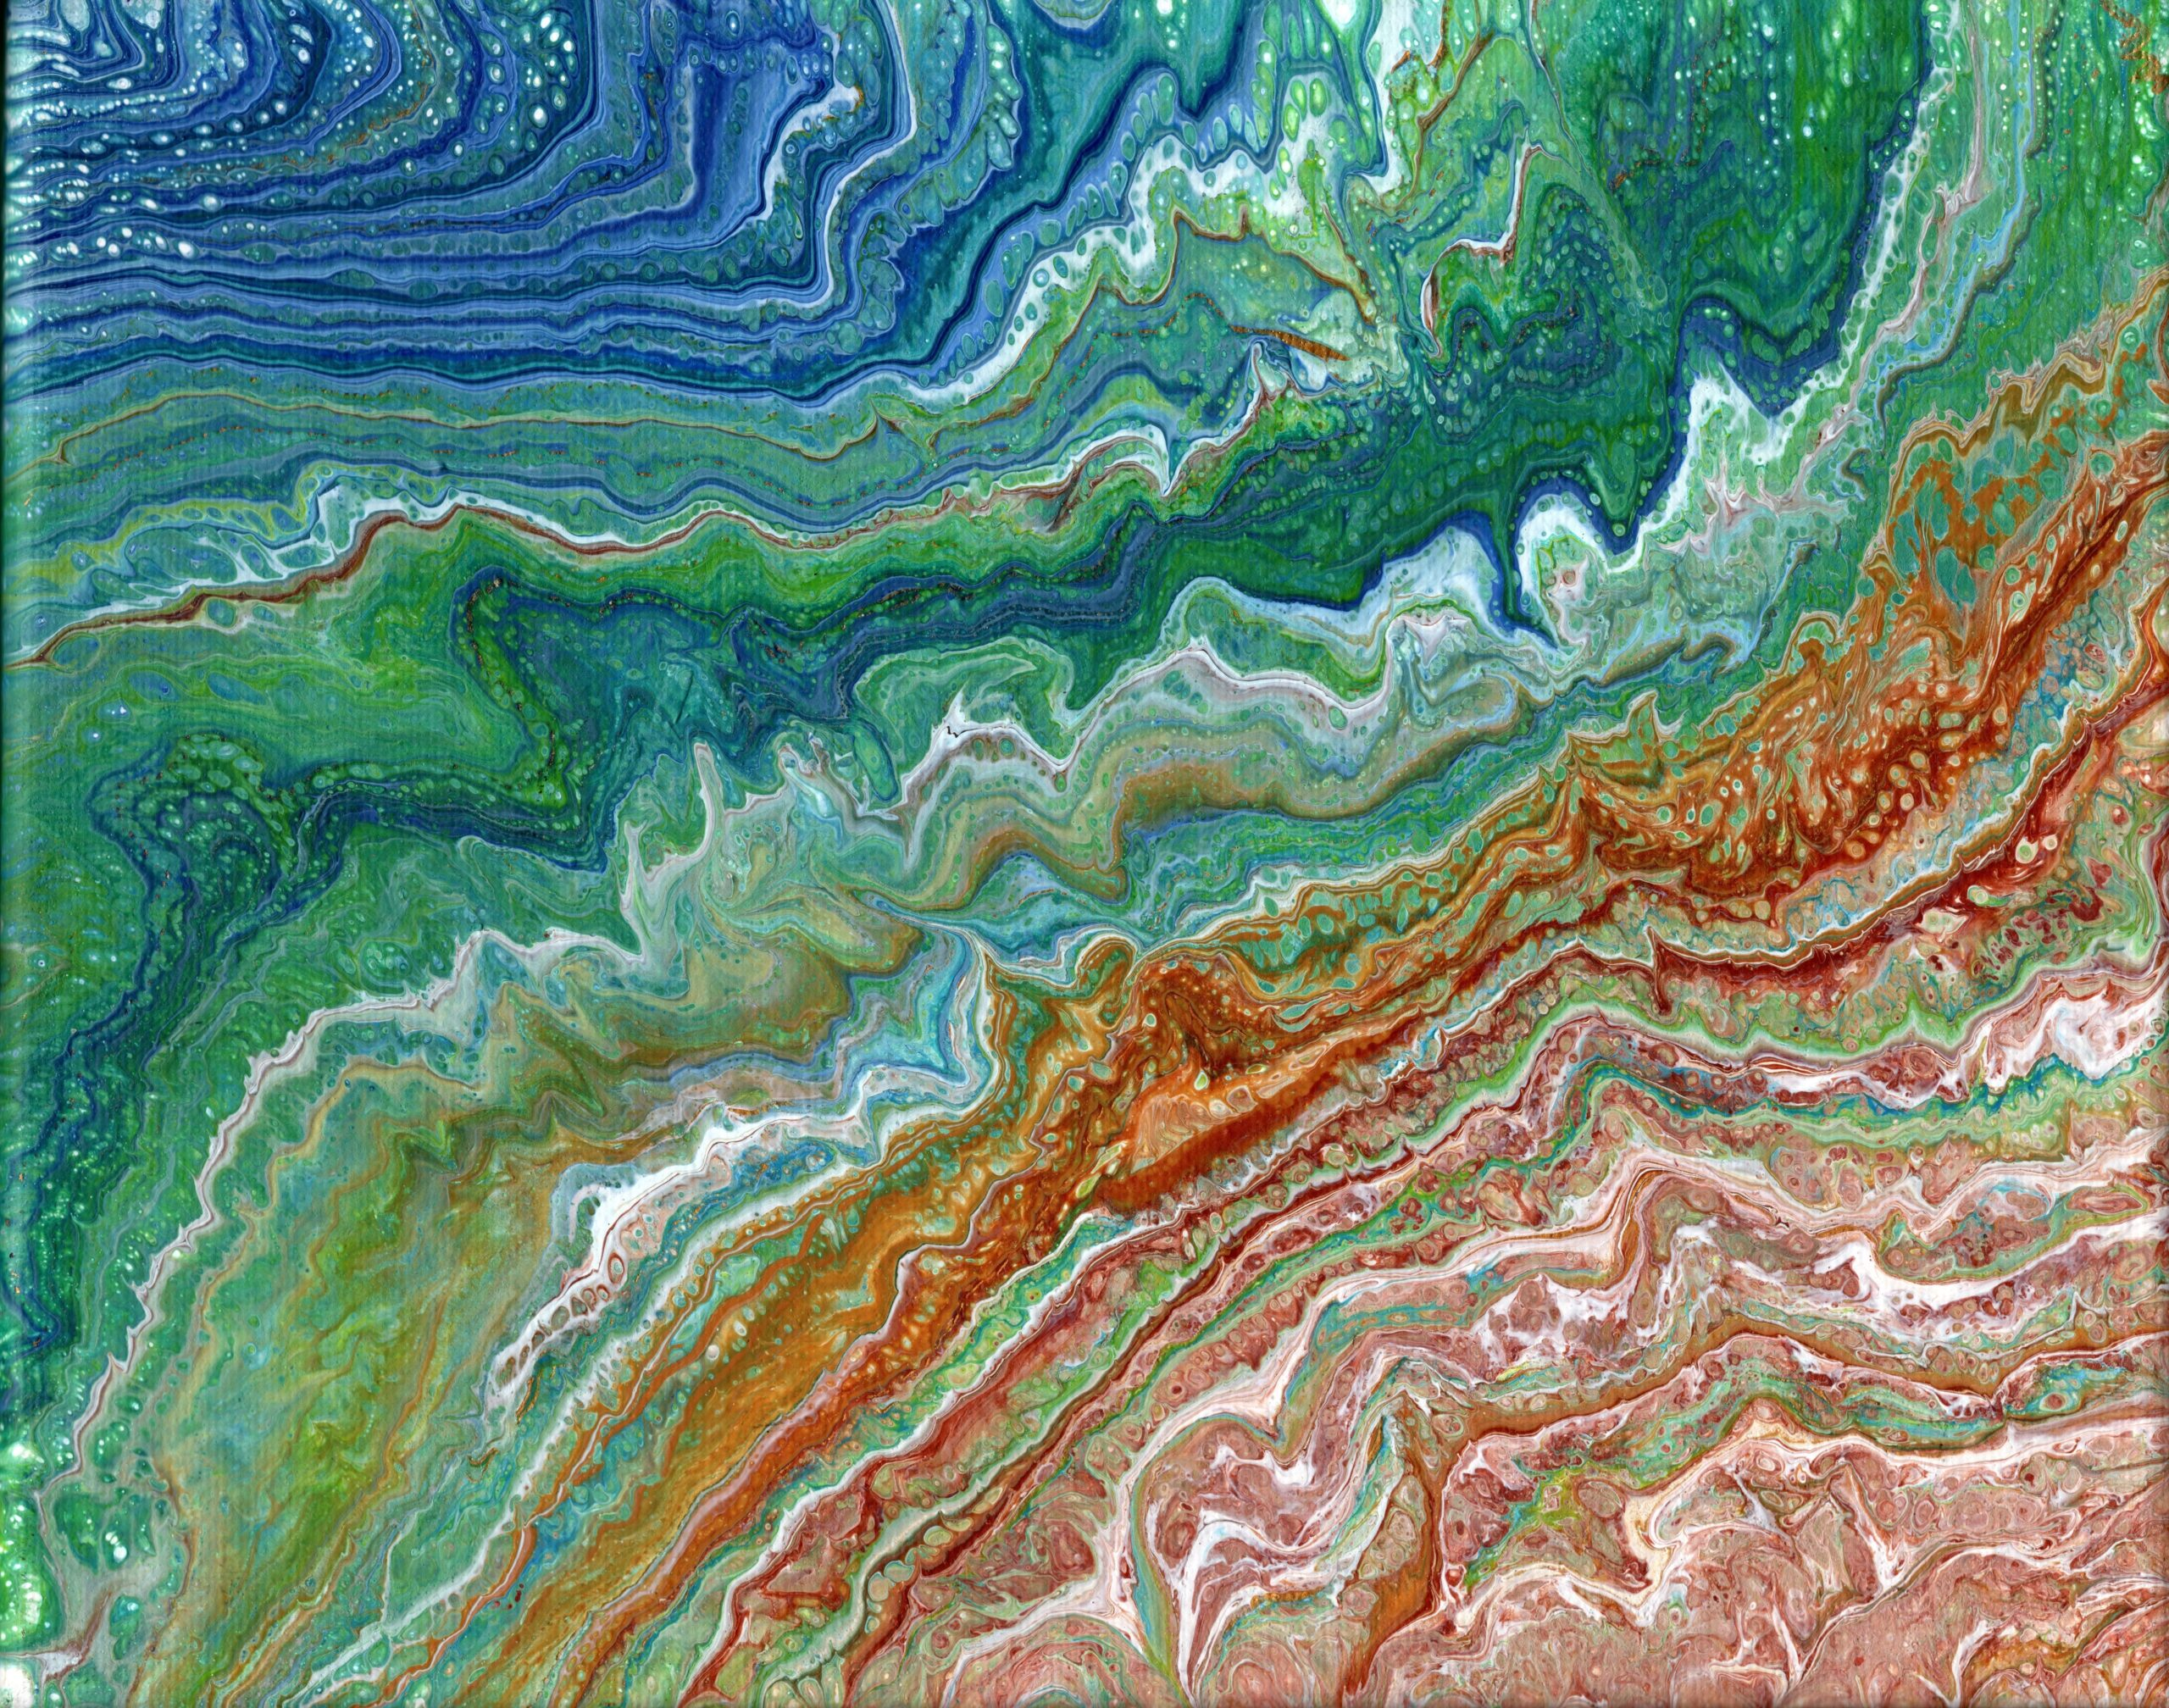 Abstract, Seascape, Acrylic, Canvas, Irish Artist, Cavan Artist, Maria Jordan-O'Reilly,